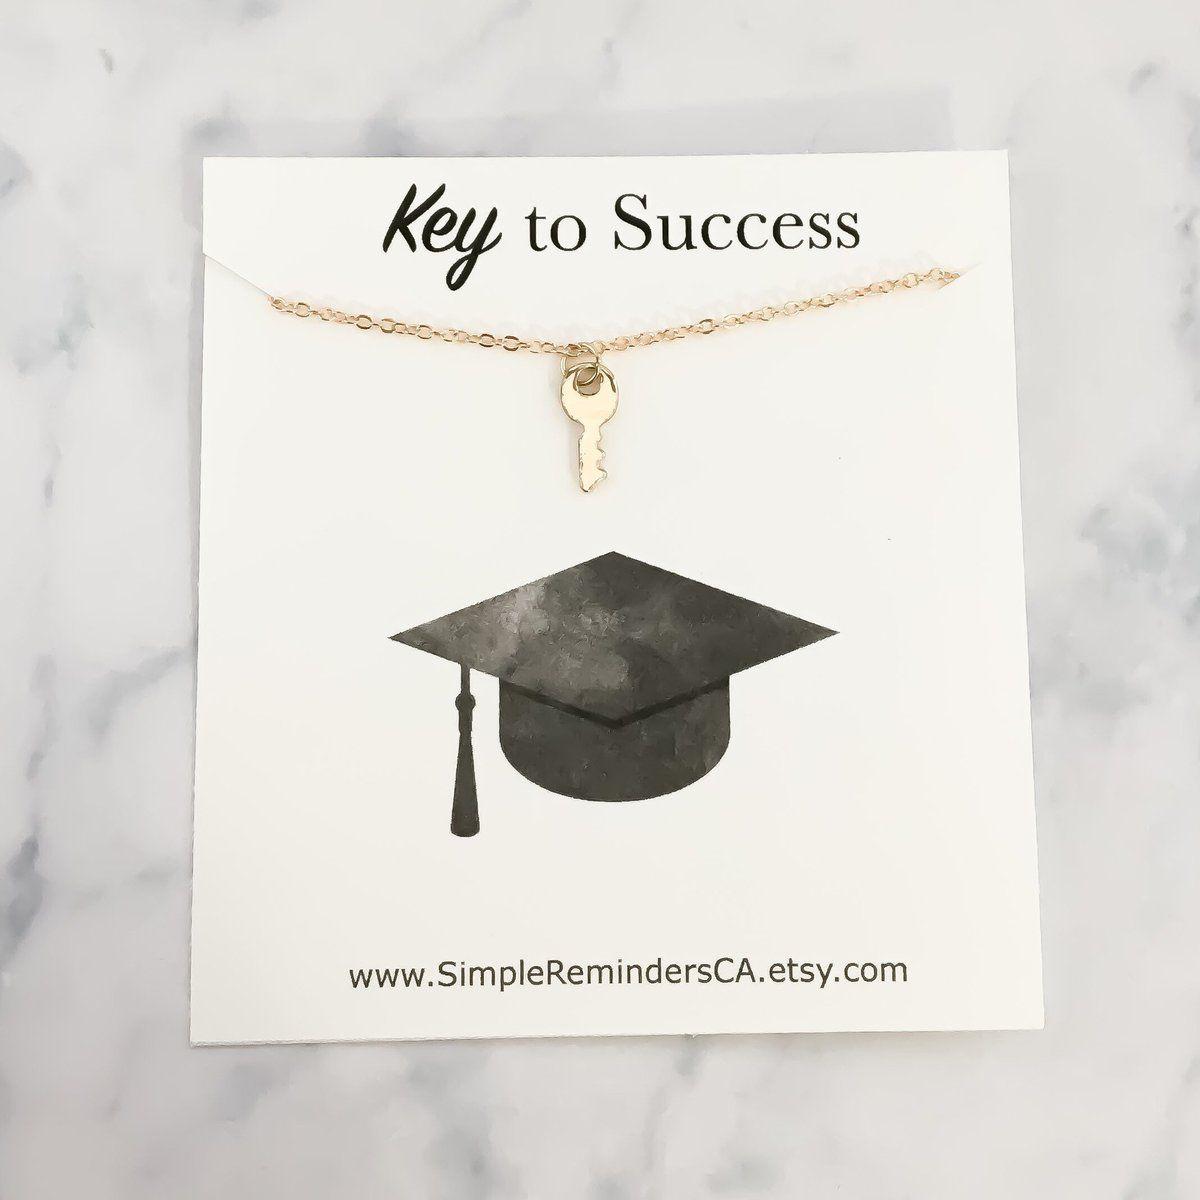 Dainty gold key necklace key to success necklace